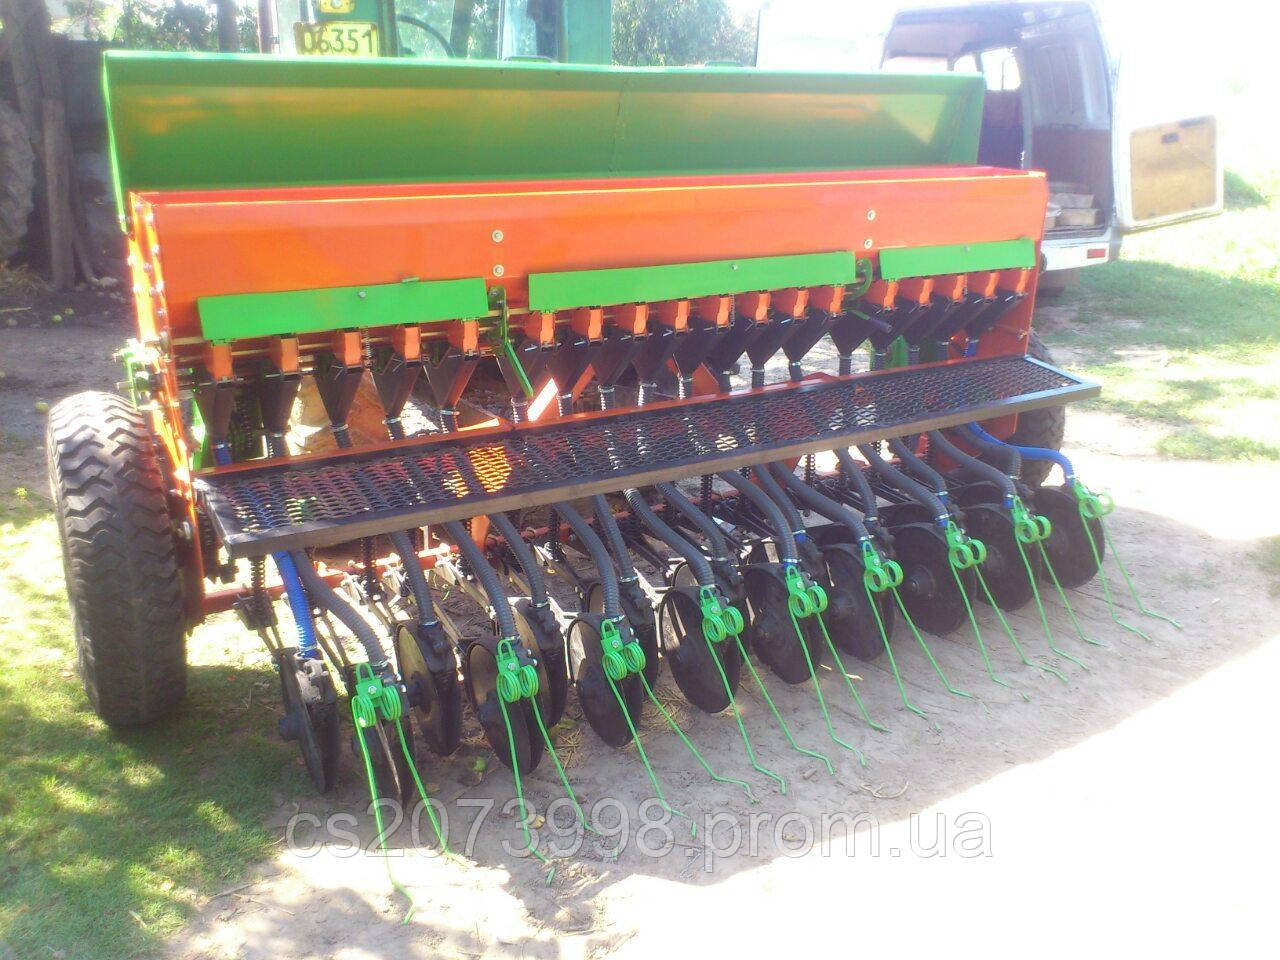 Сеялка зерновая СЗ 1,8-3м